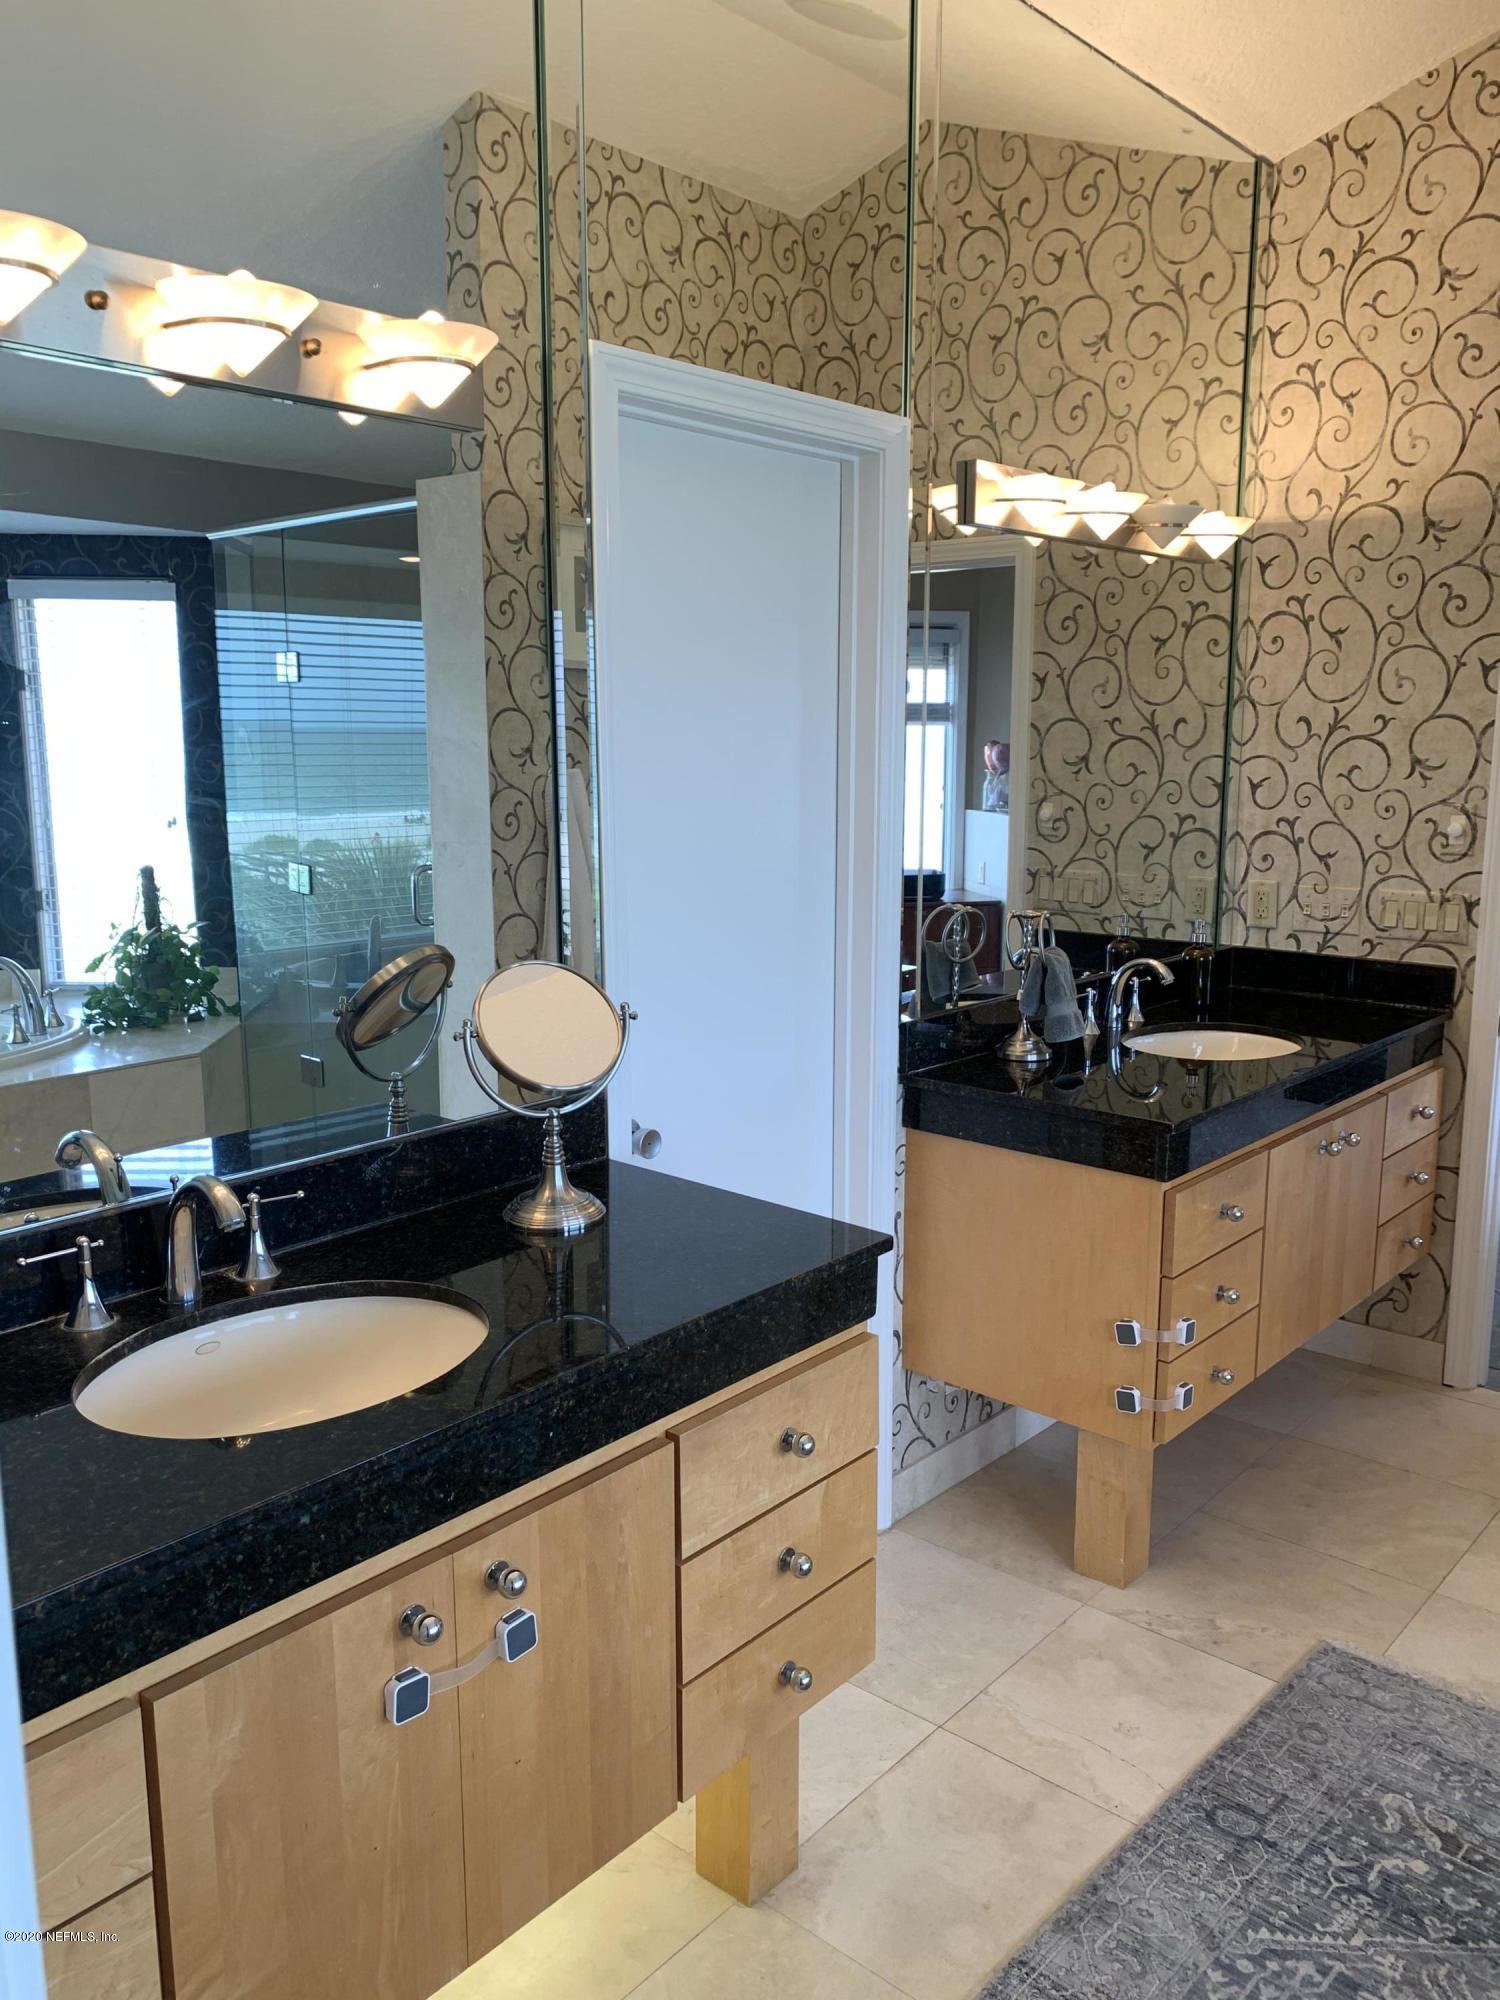 1881 BEACH, ATLANTIC BEACH, FLORIDA 32233, 5 Bedrooms Bedrooms, ,4 BathroomsBathrooms,Residential,For sale,BEACH,1069710